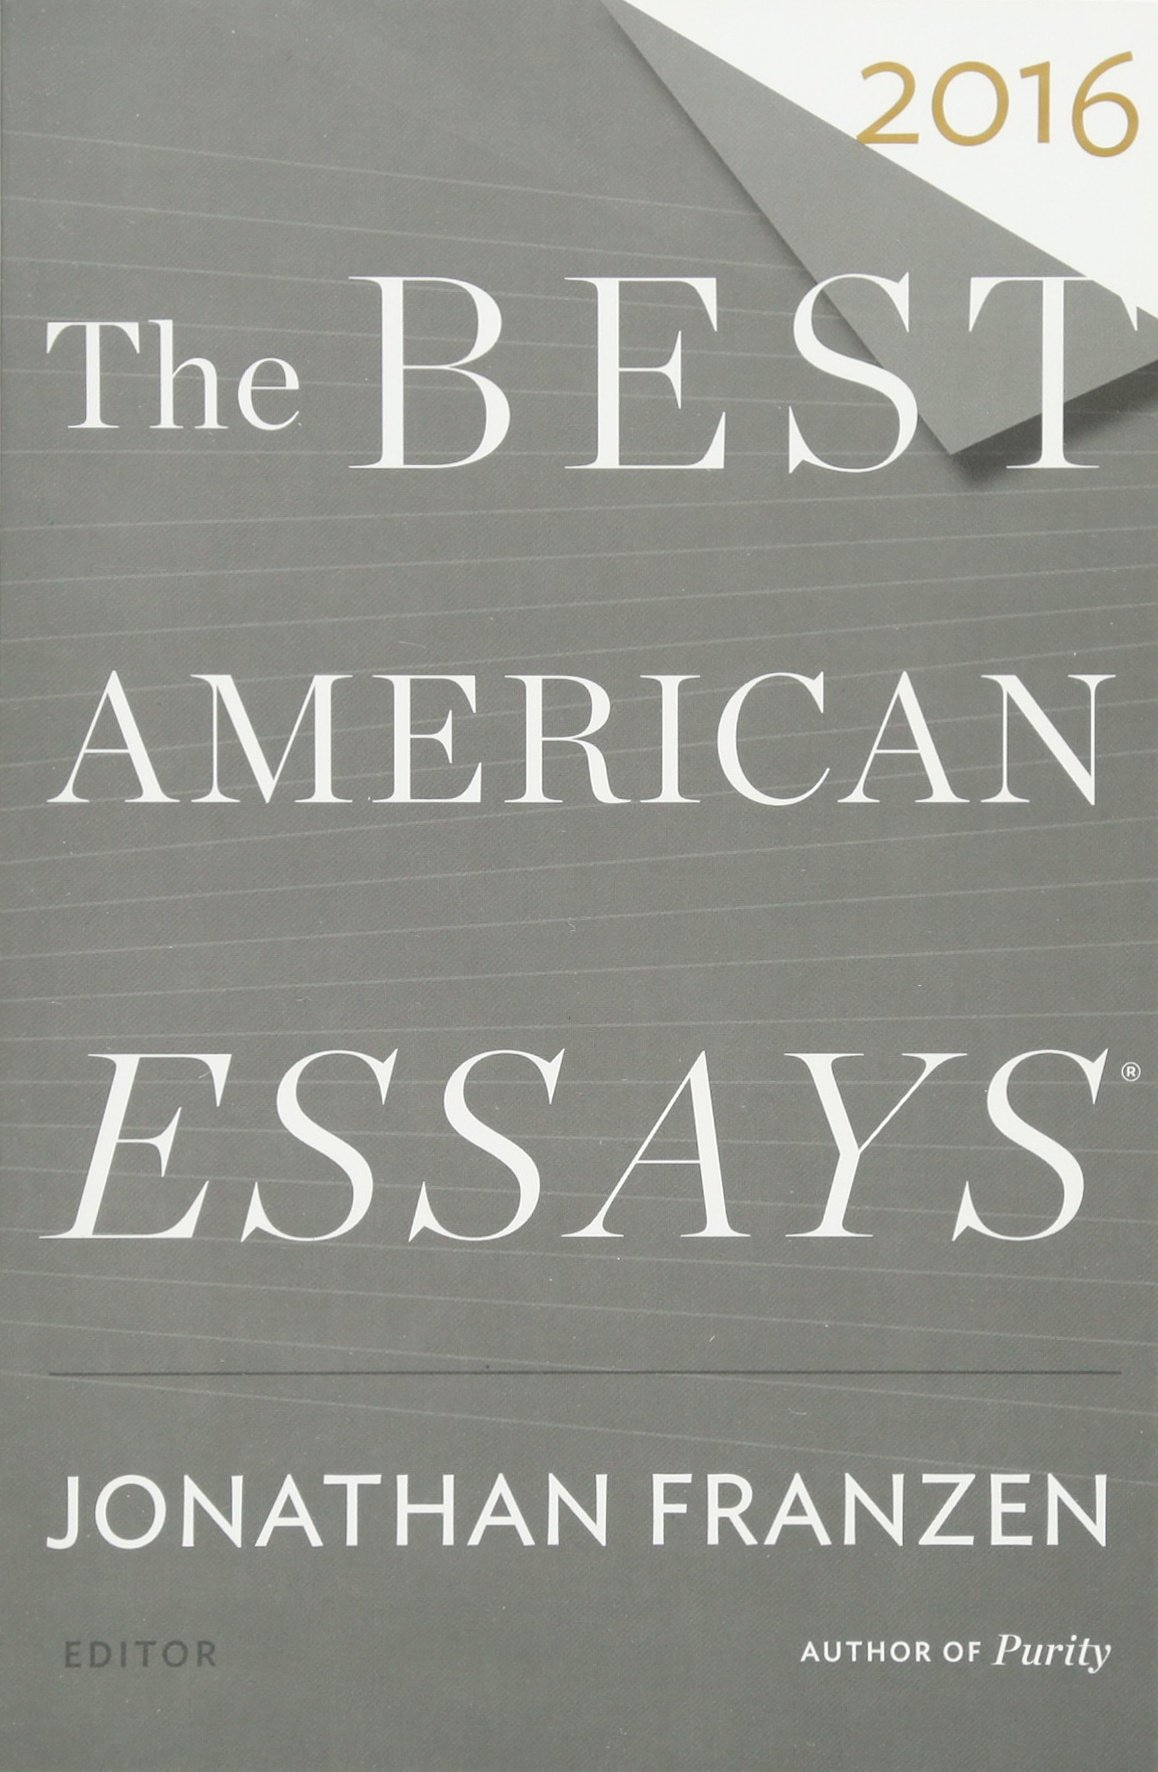 001 71a6bhsgsdl Essay Example Best Essays Breathtaking 2016 The American Audiobook Short Pdf Full